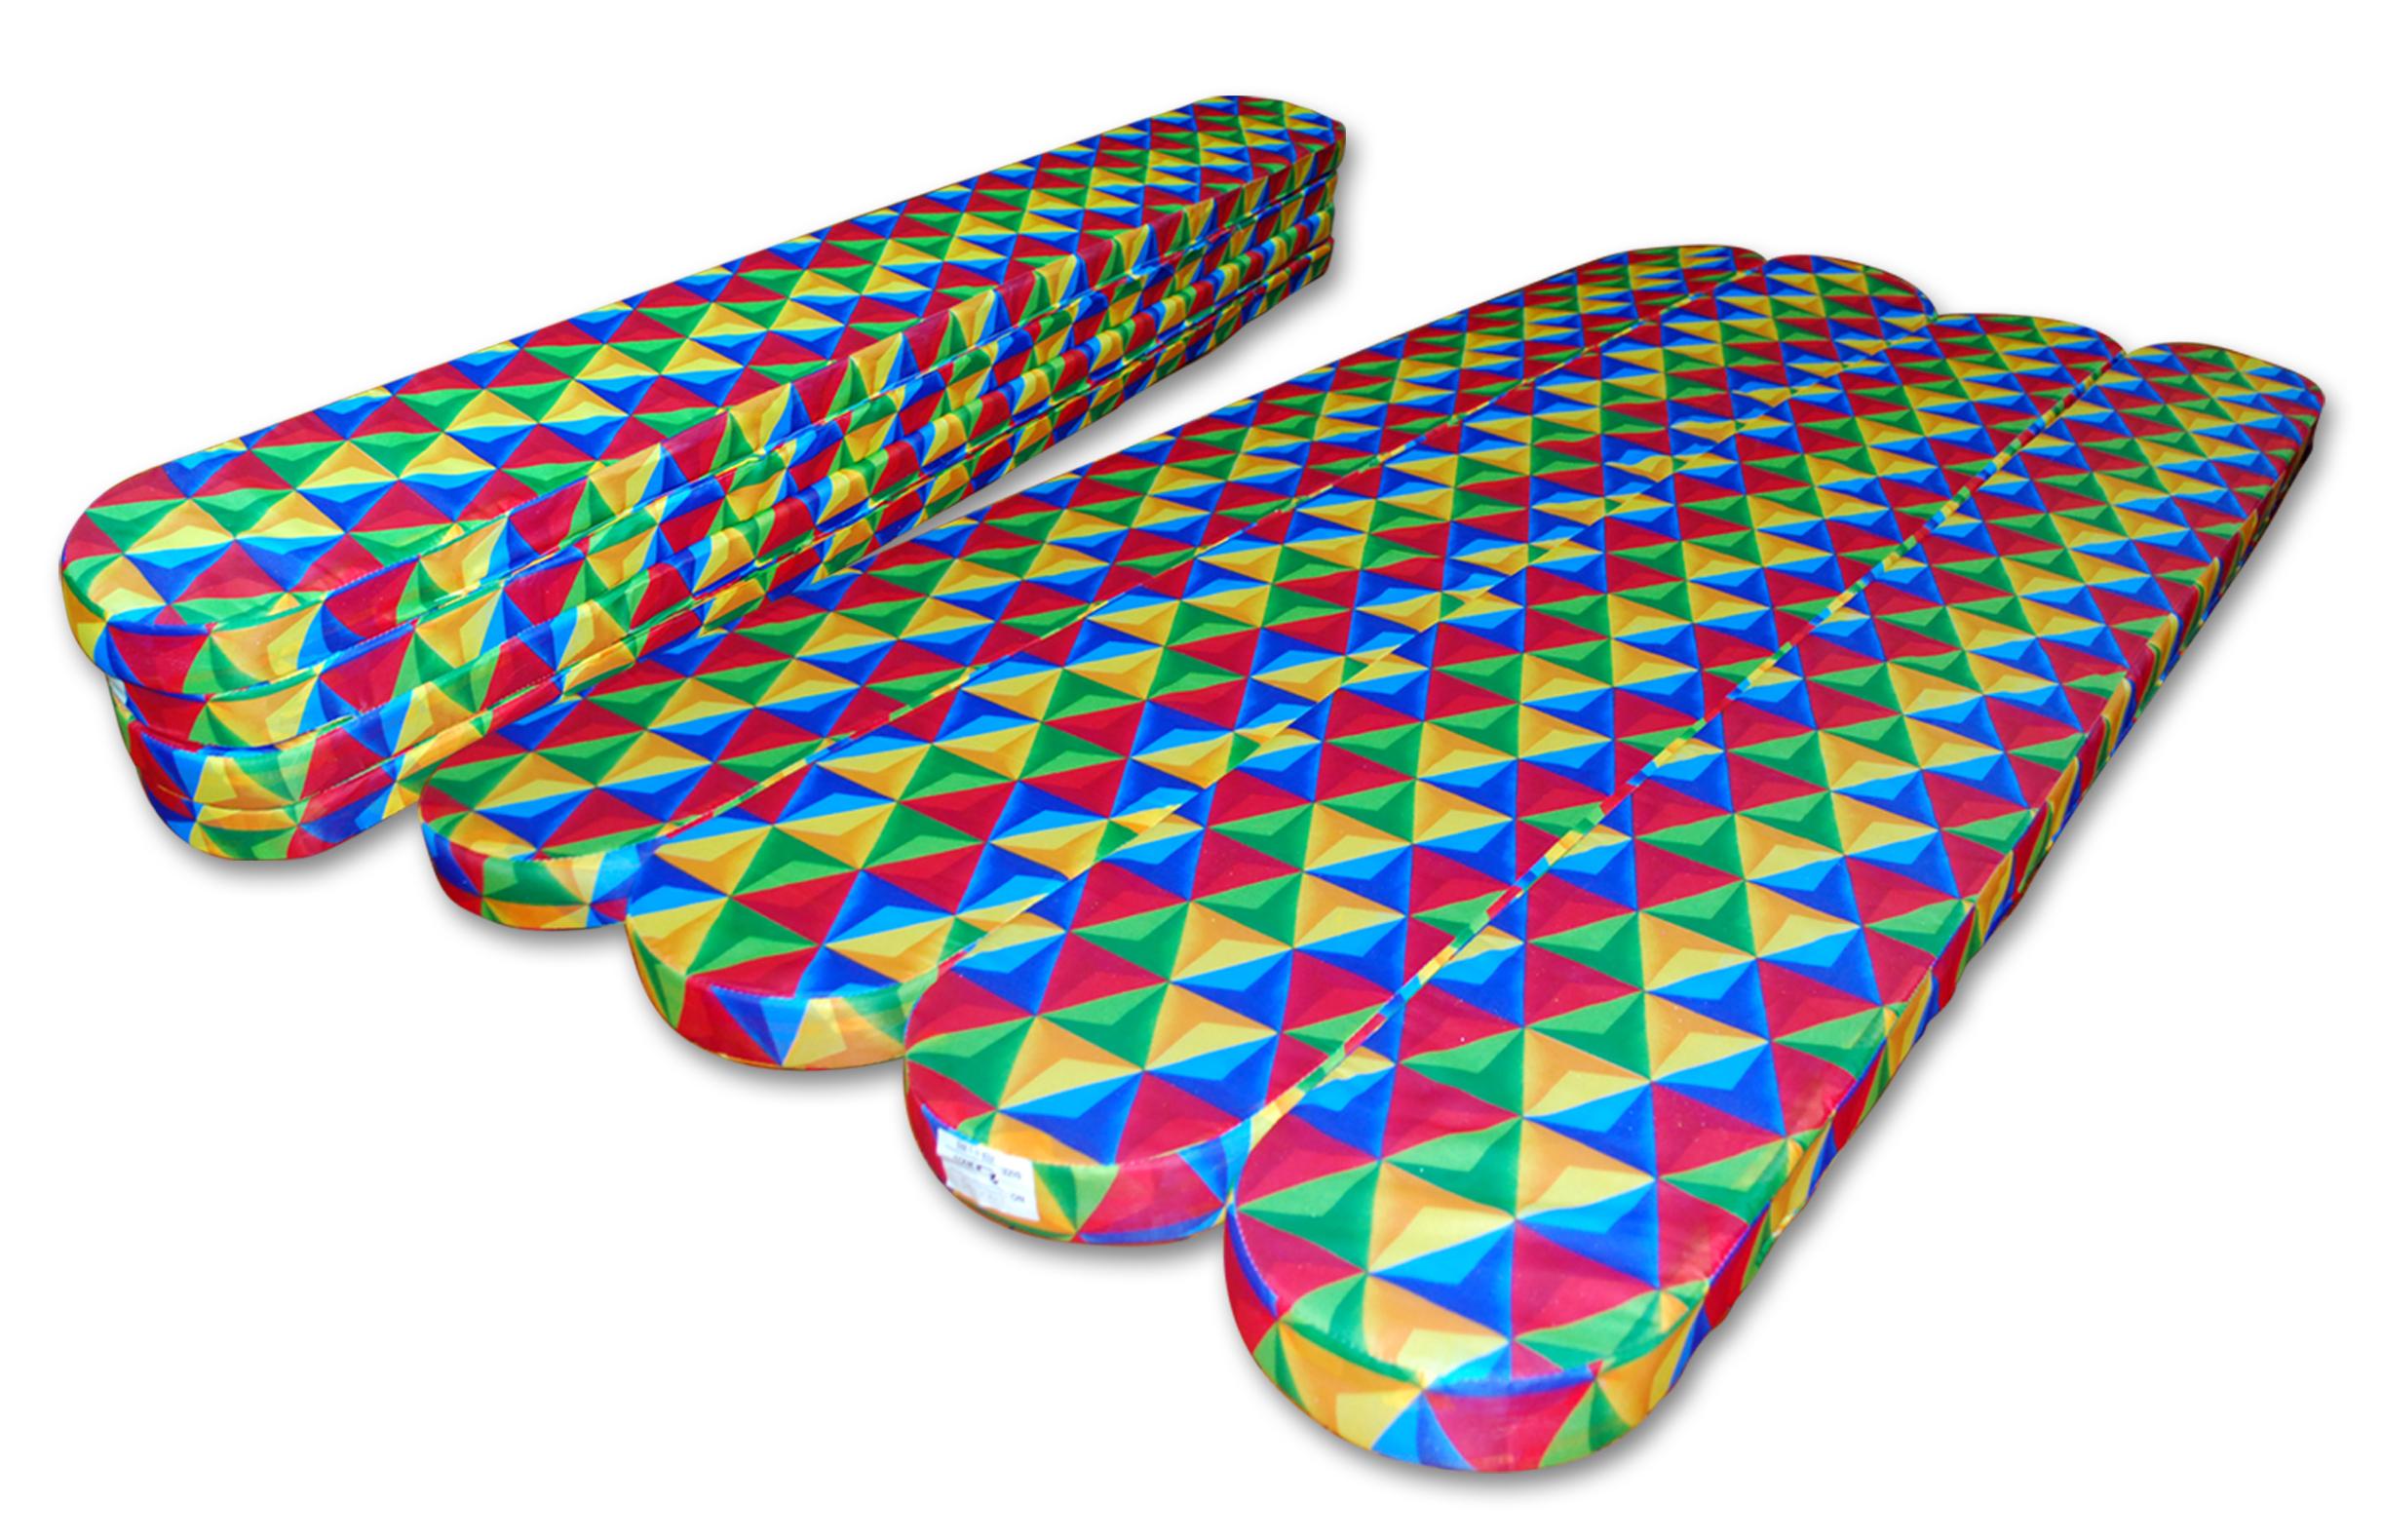 folding foam mattress. Fold A Bol Folding Foam Mattress